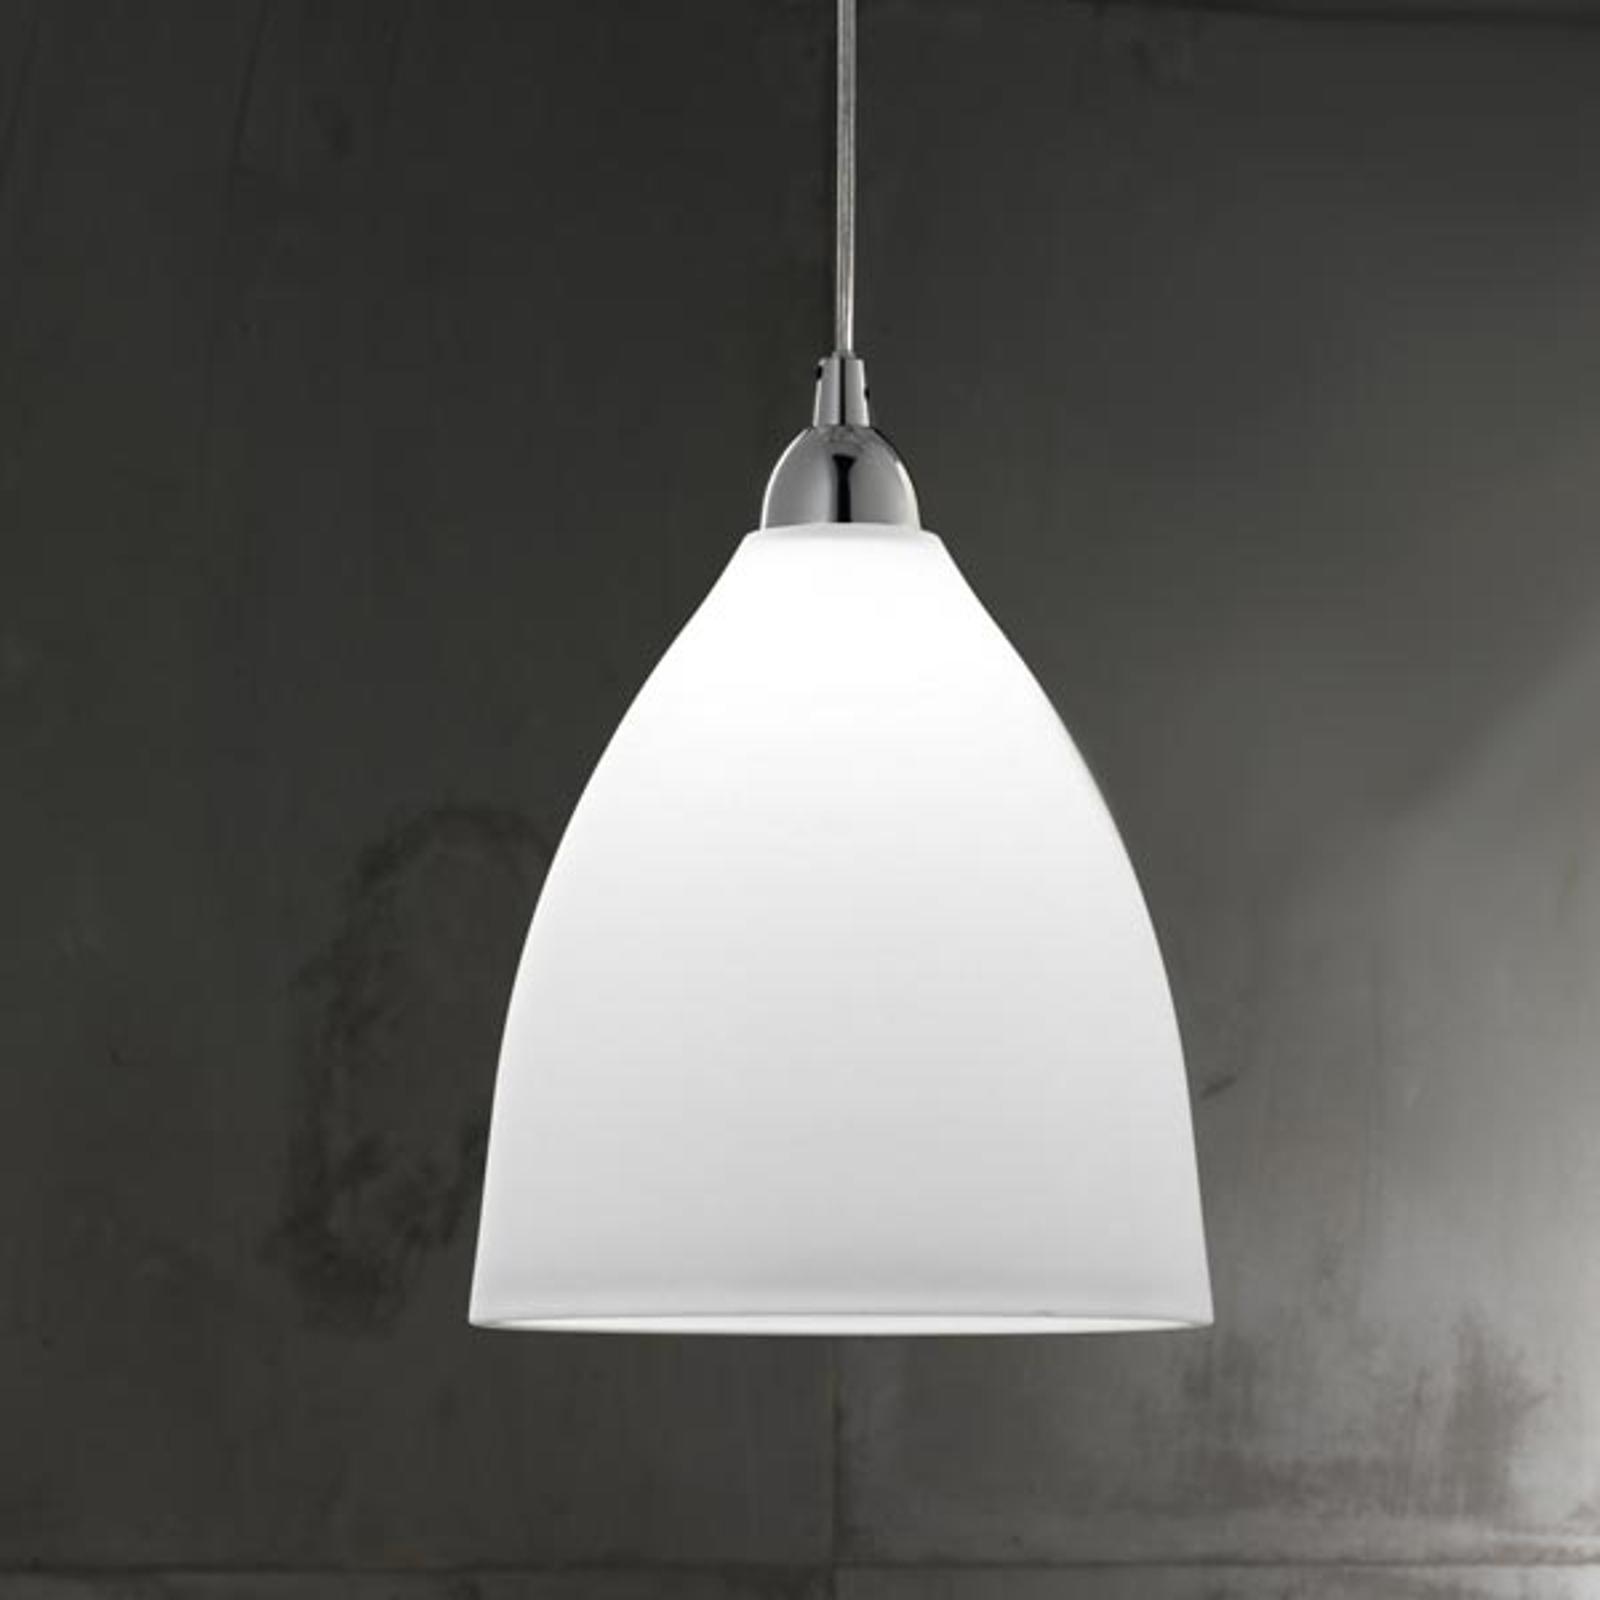 Glazen hanglamp PROVENZA, 20 cm, wit